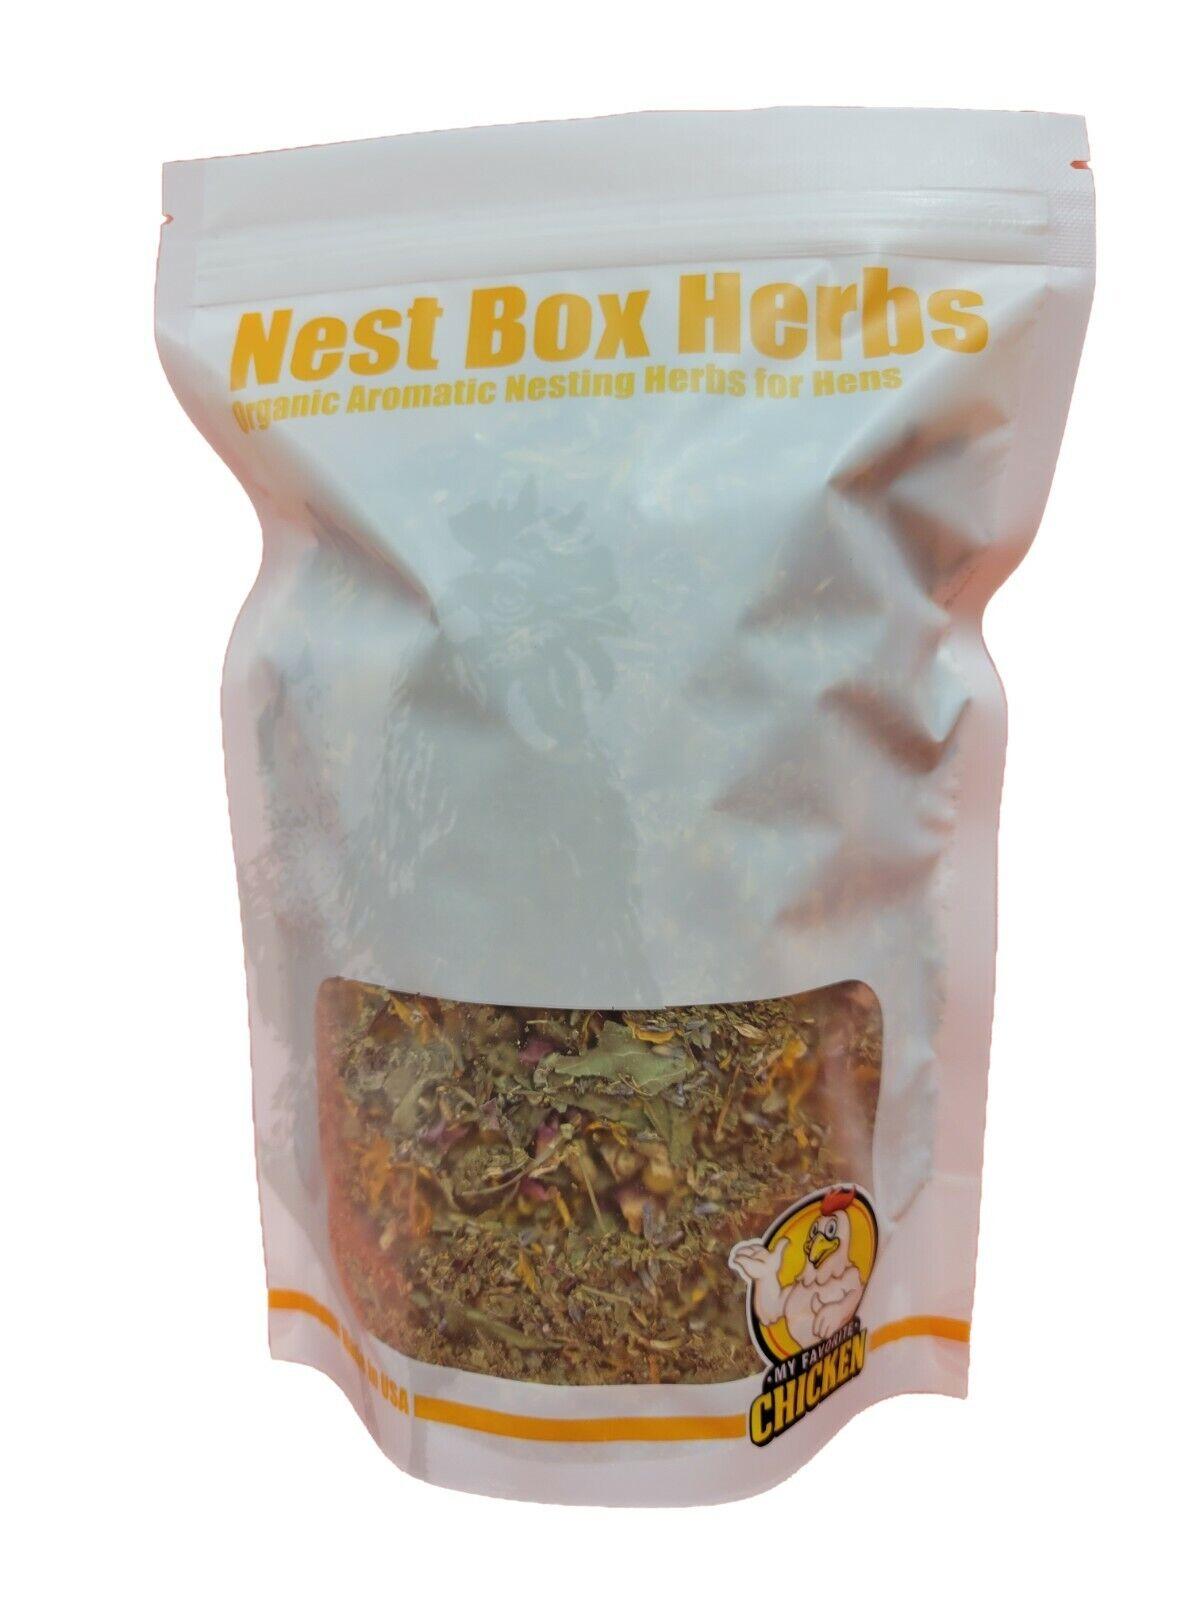 Chicken Nest Box Herbs for Hens, Organic, Non-GMO 6 oz